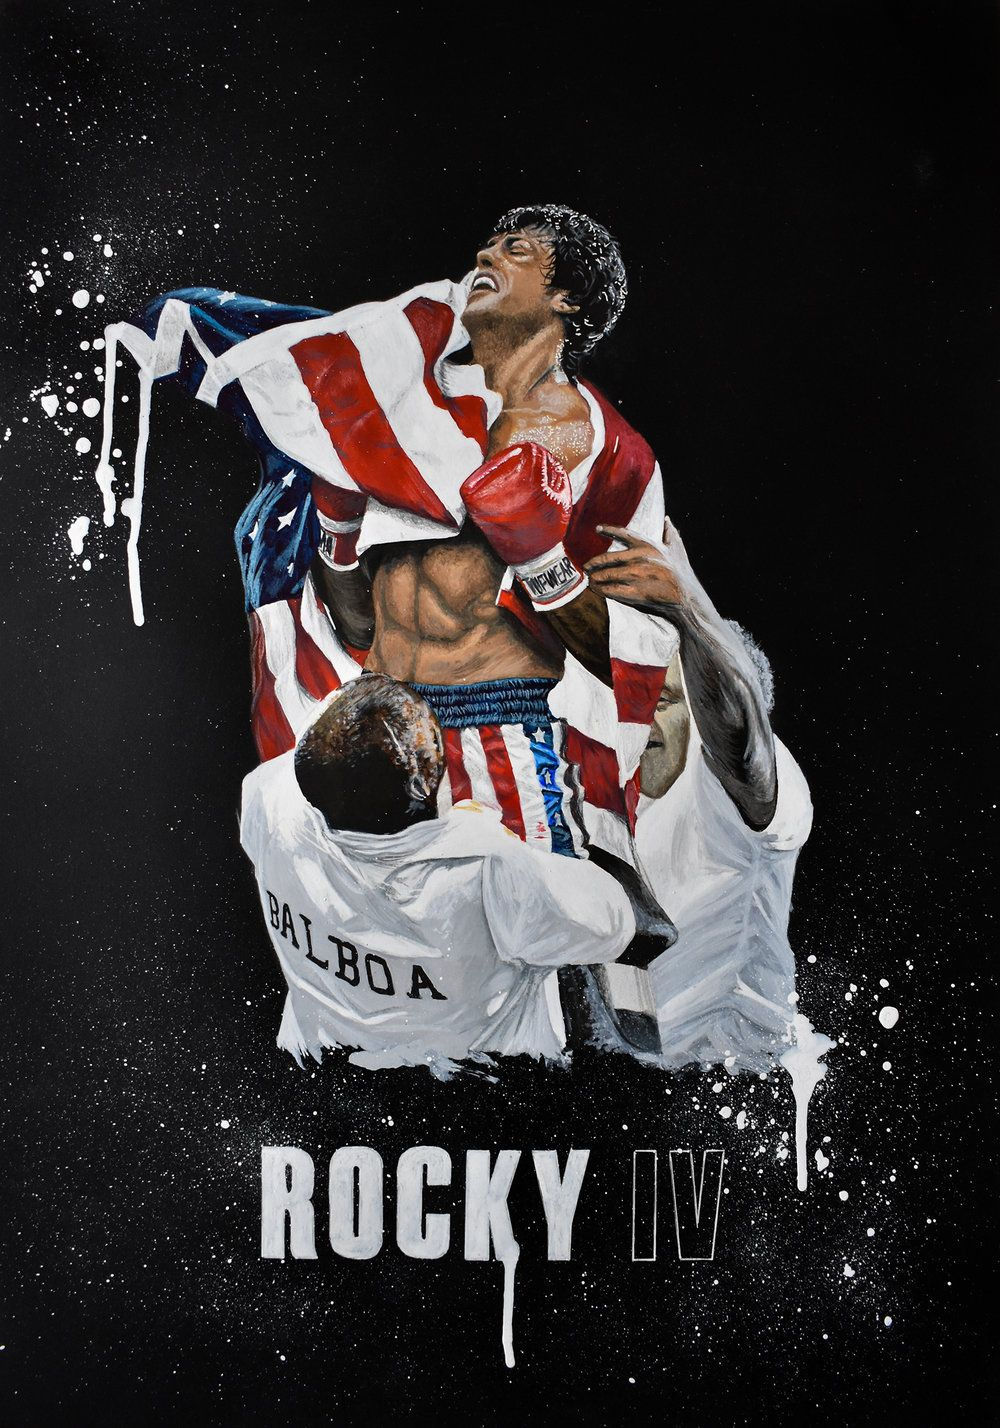 Rocky Iv Pop Art Painting Commission Obrazky